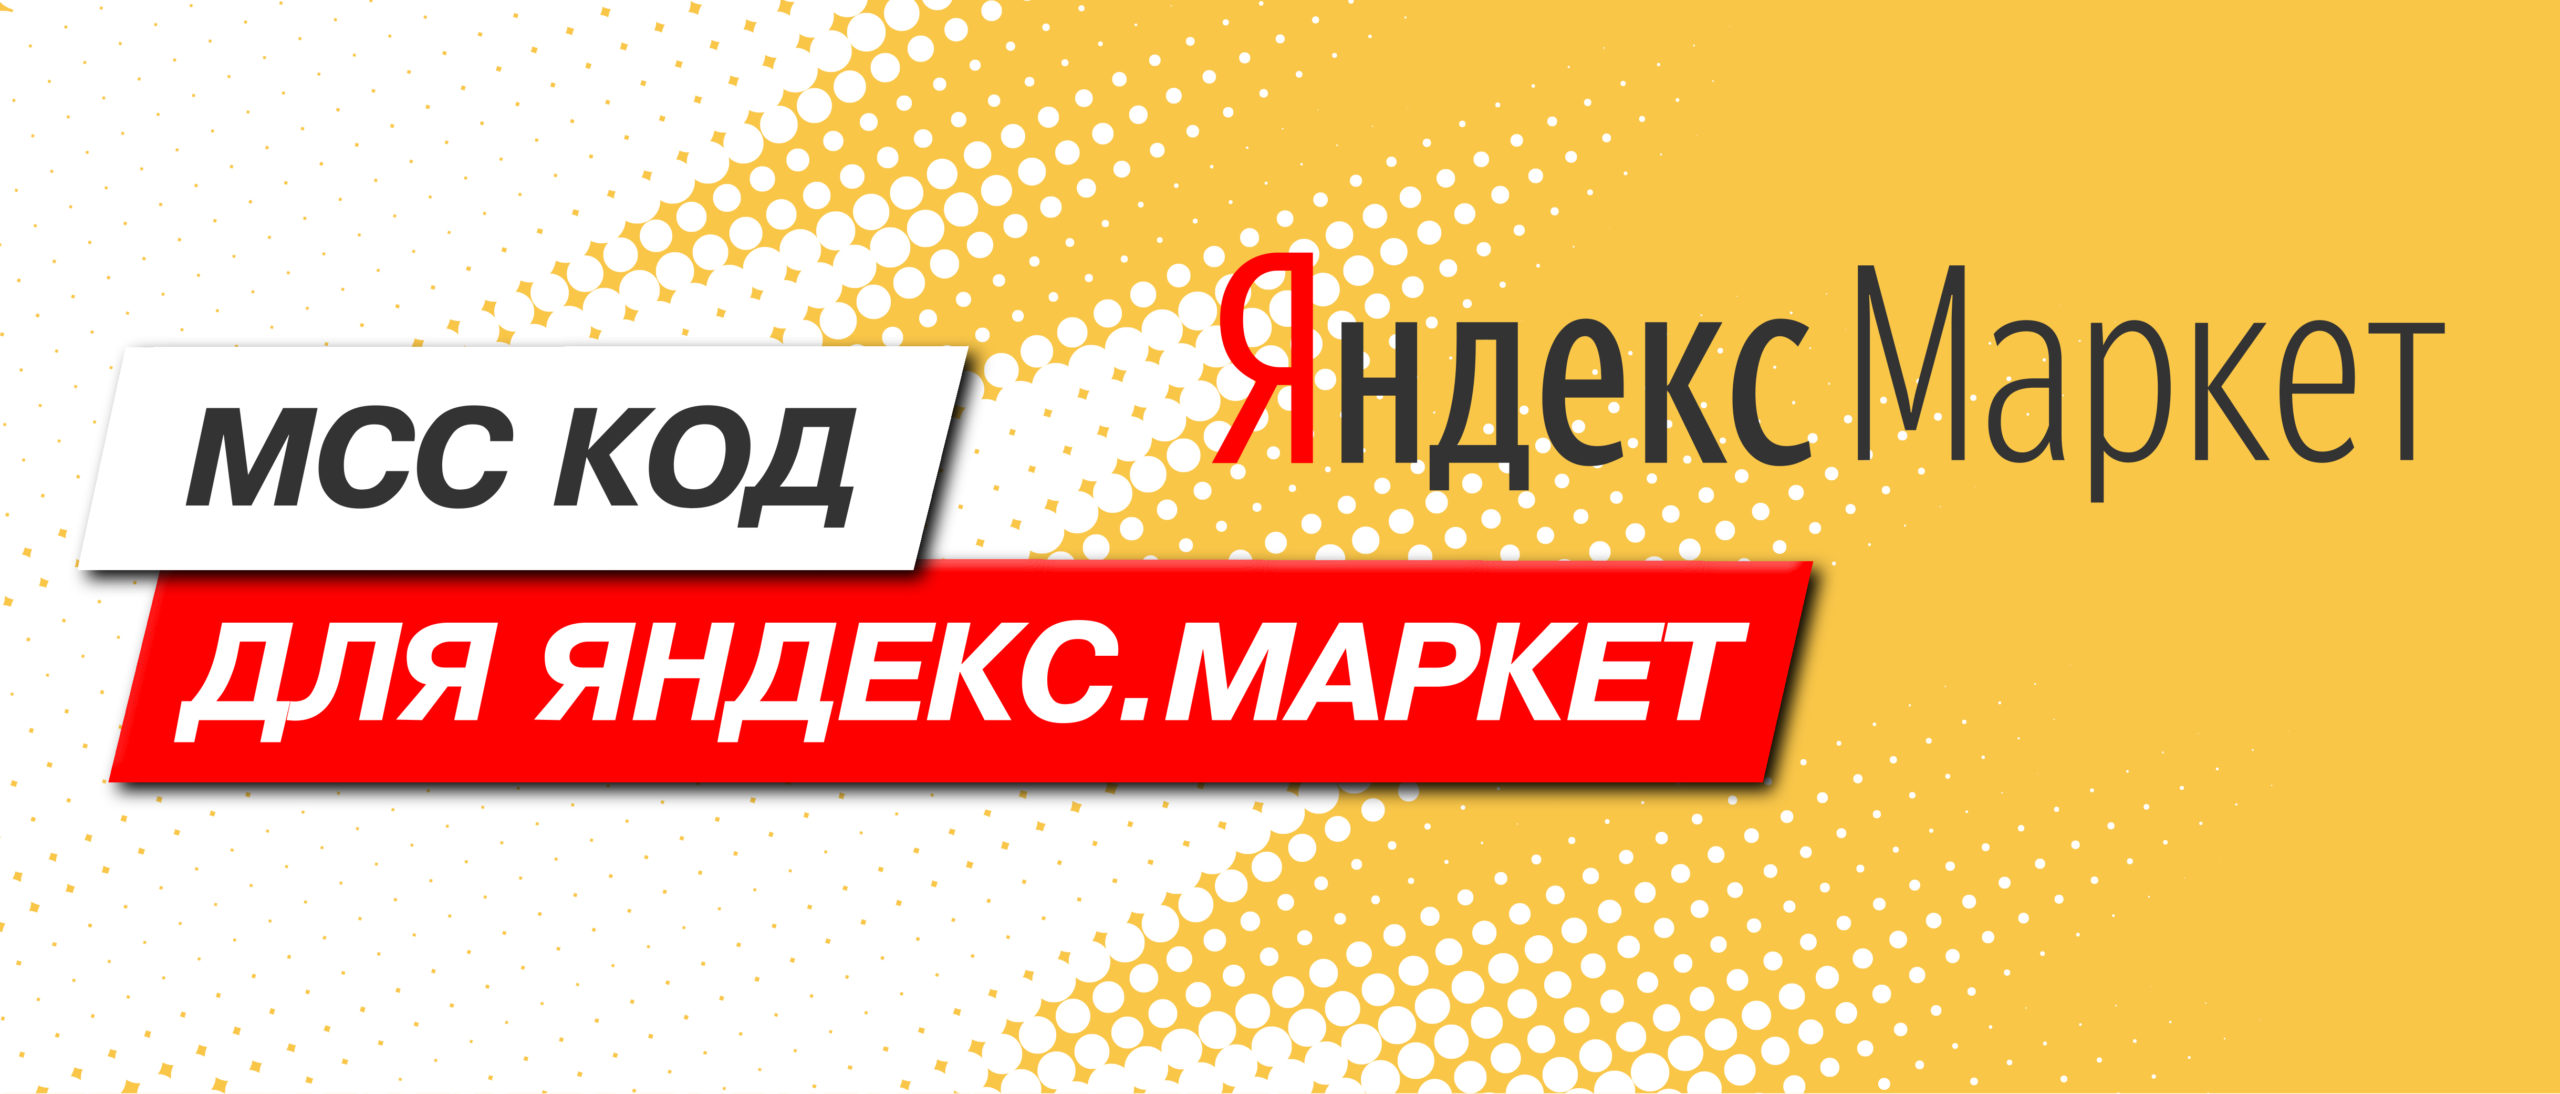 Код МСС для Яндекс.Маркет